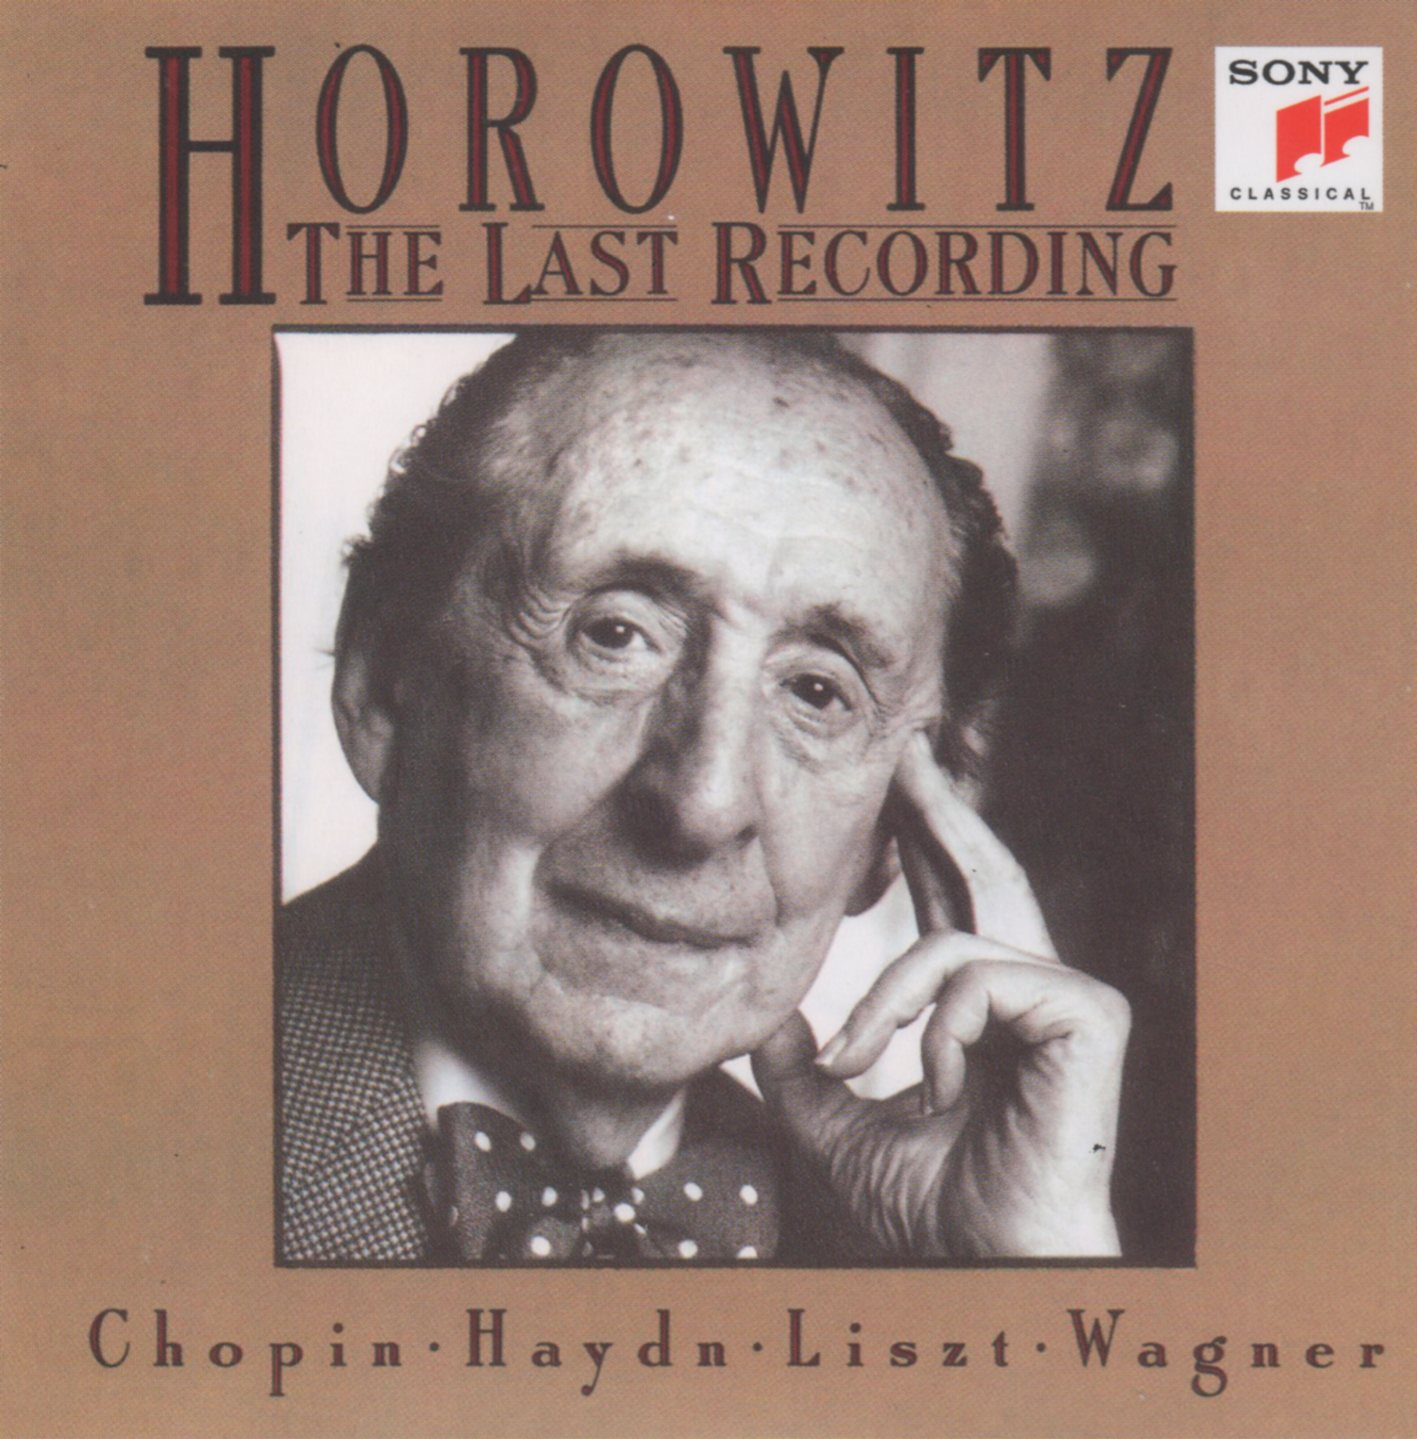 Vladimir Horowitz - The Complete Original Jacket Collection: Limited Edition Box Set 70 CDs - Part2 (2009)